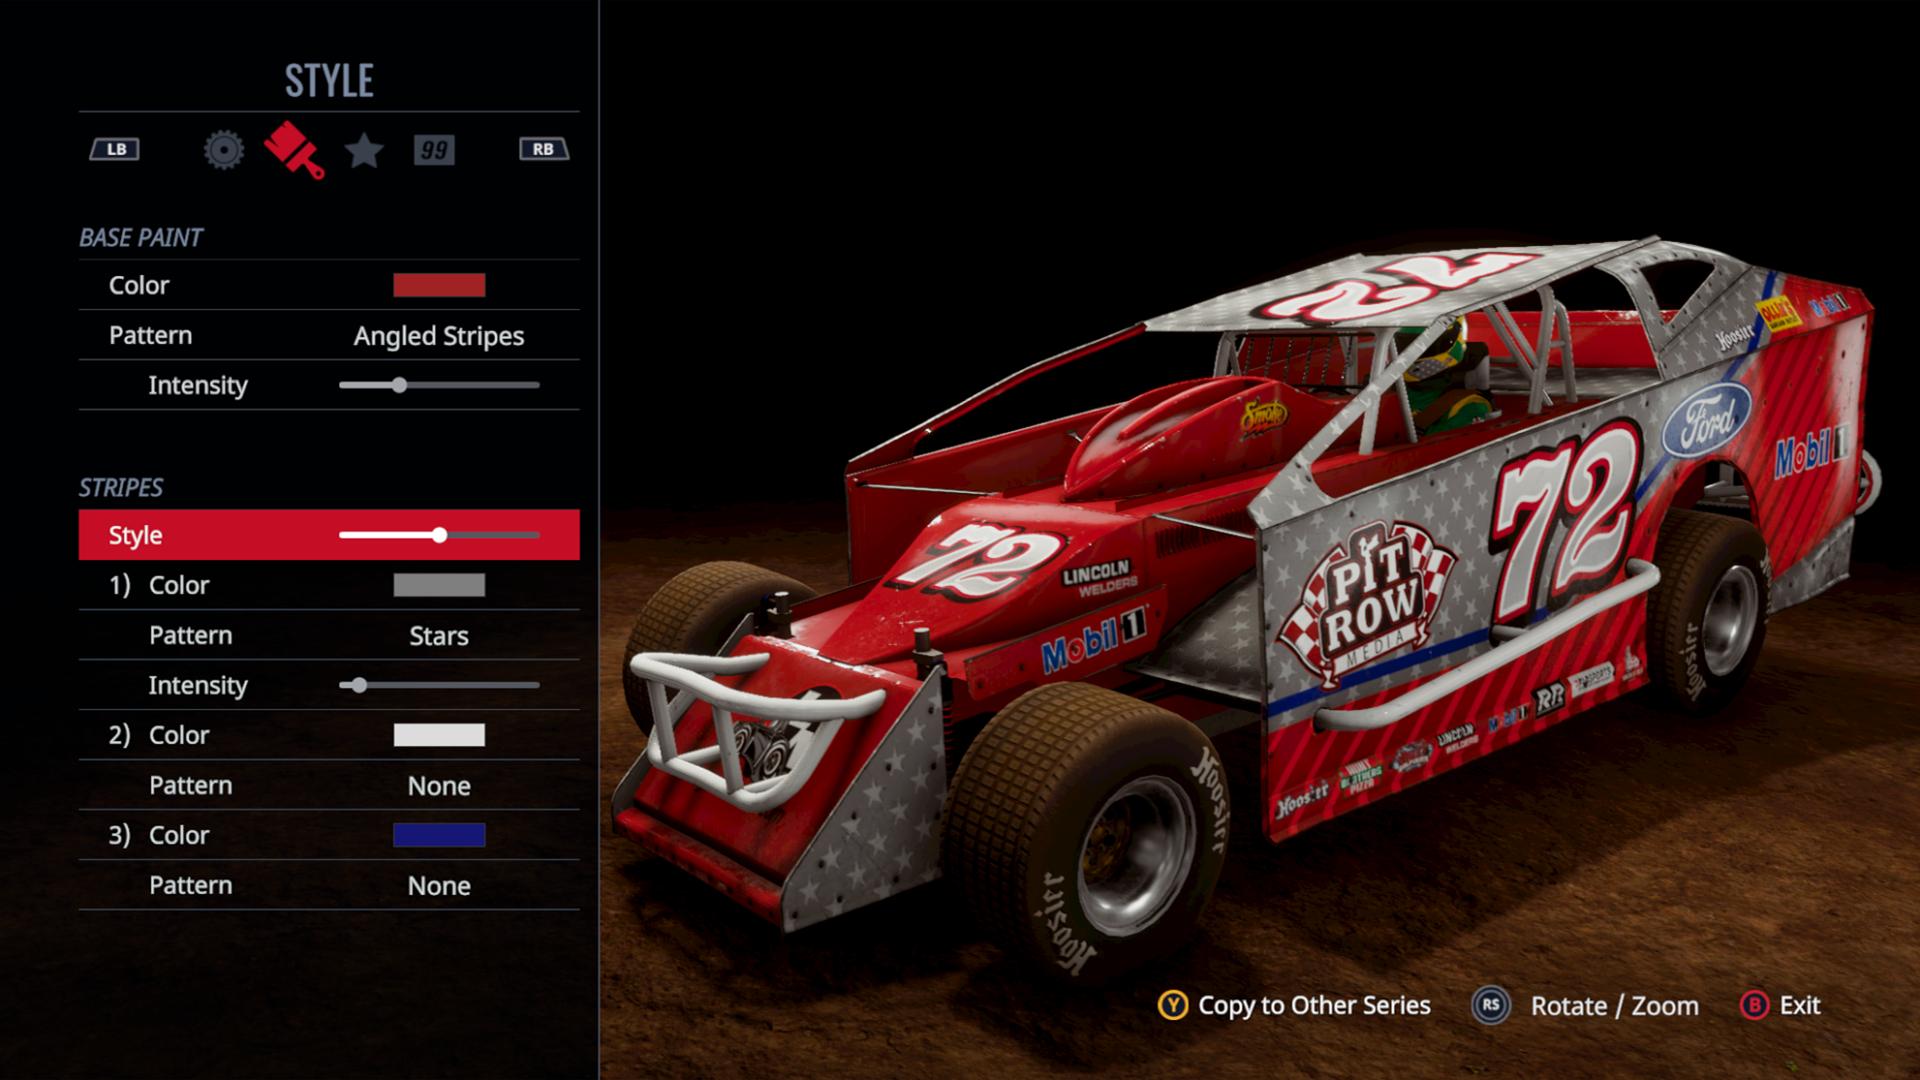 Tony-Stewarts-All-American-Racing-8